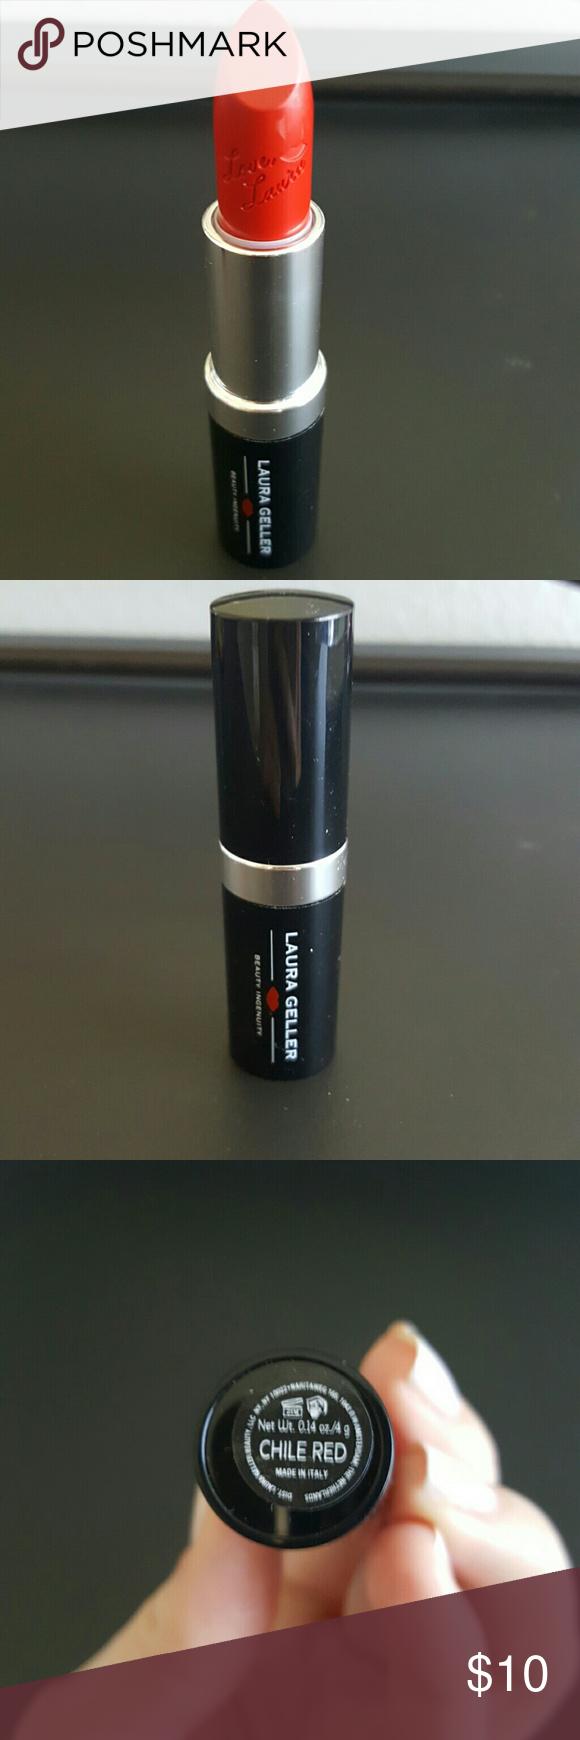 Laura Geller lipstick brand new, never used Chile Red Laura Geller lipstick brand new laura geller Makeup Lipstick